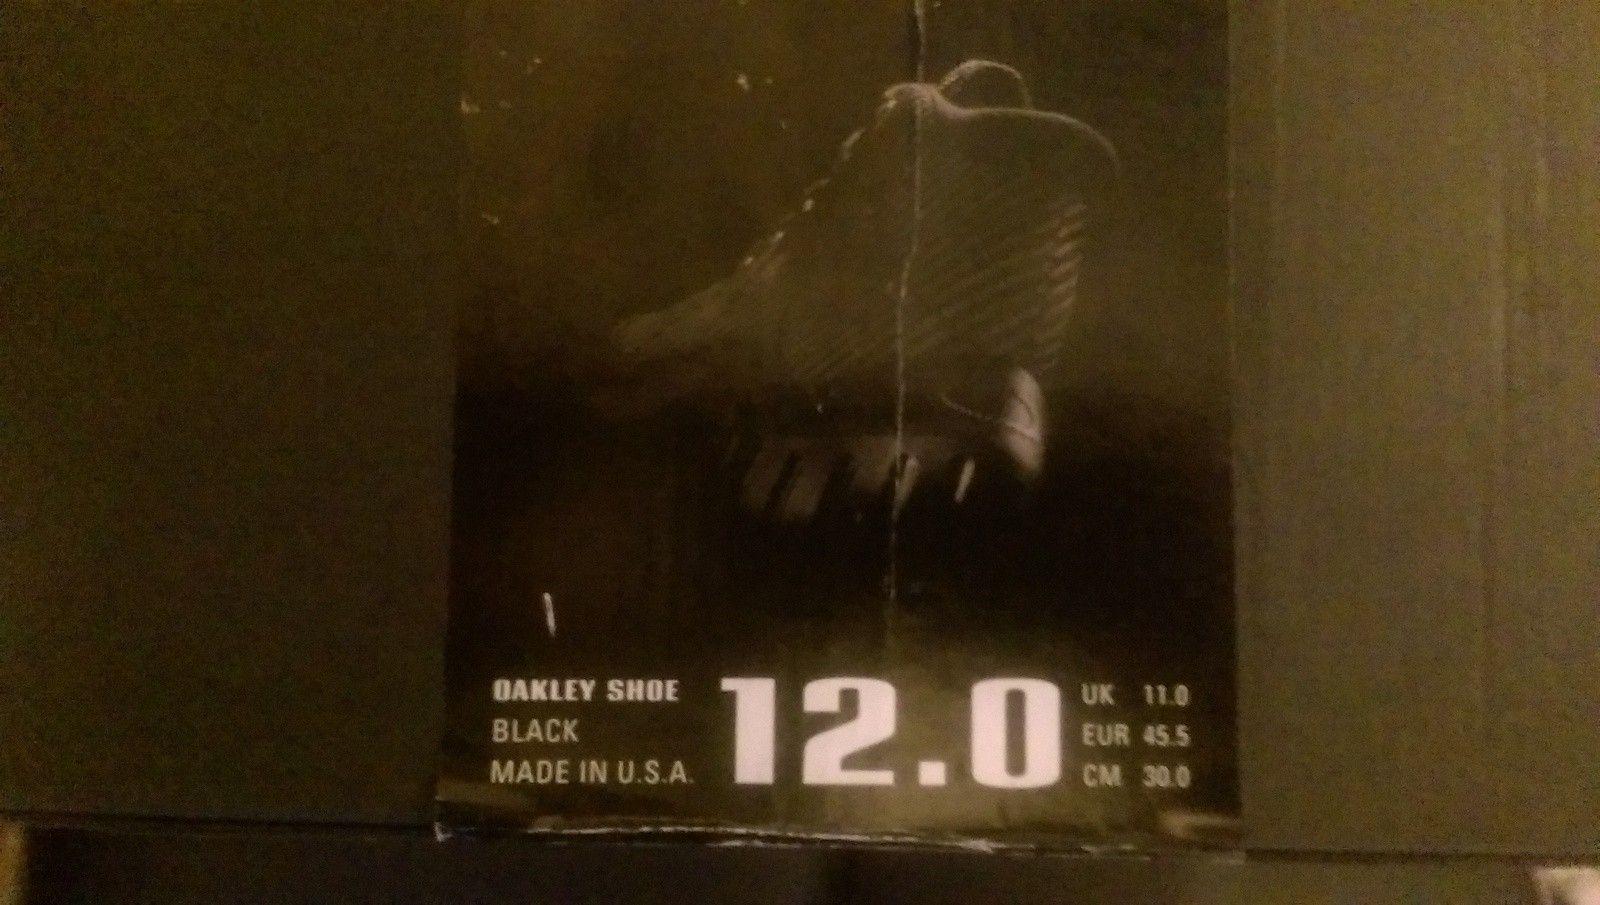 Oakley One Shoe Boot Black (US 12, UK 11) - IMAG1599.jpg